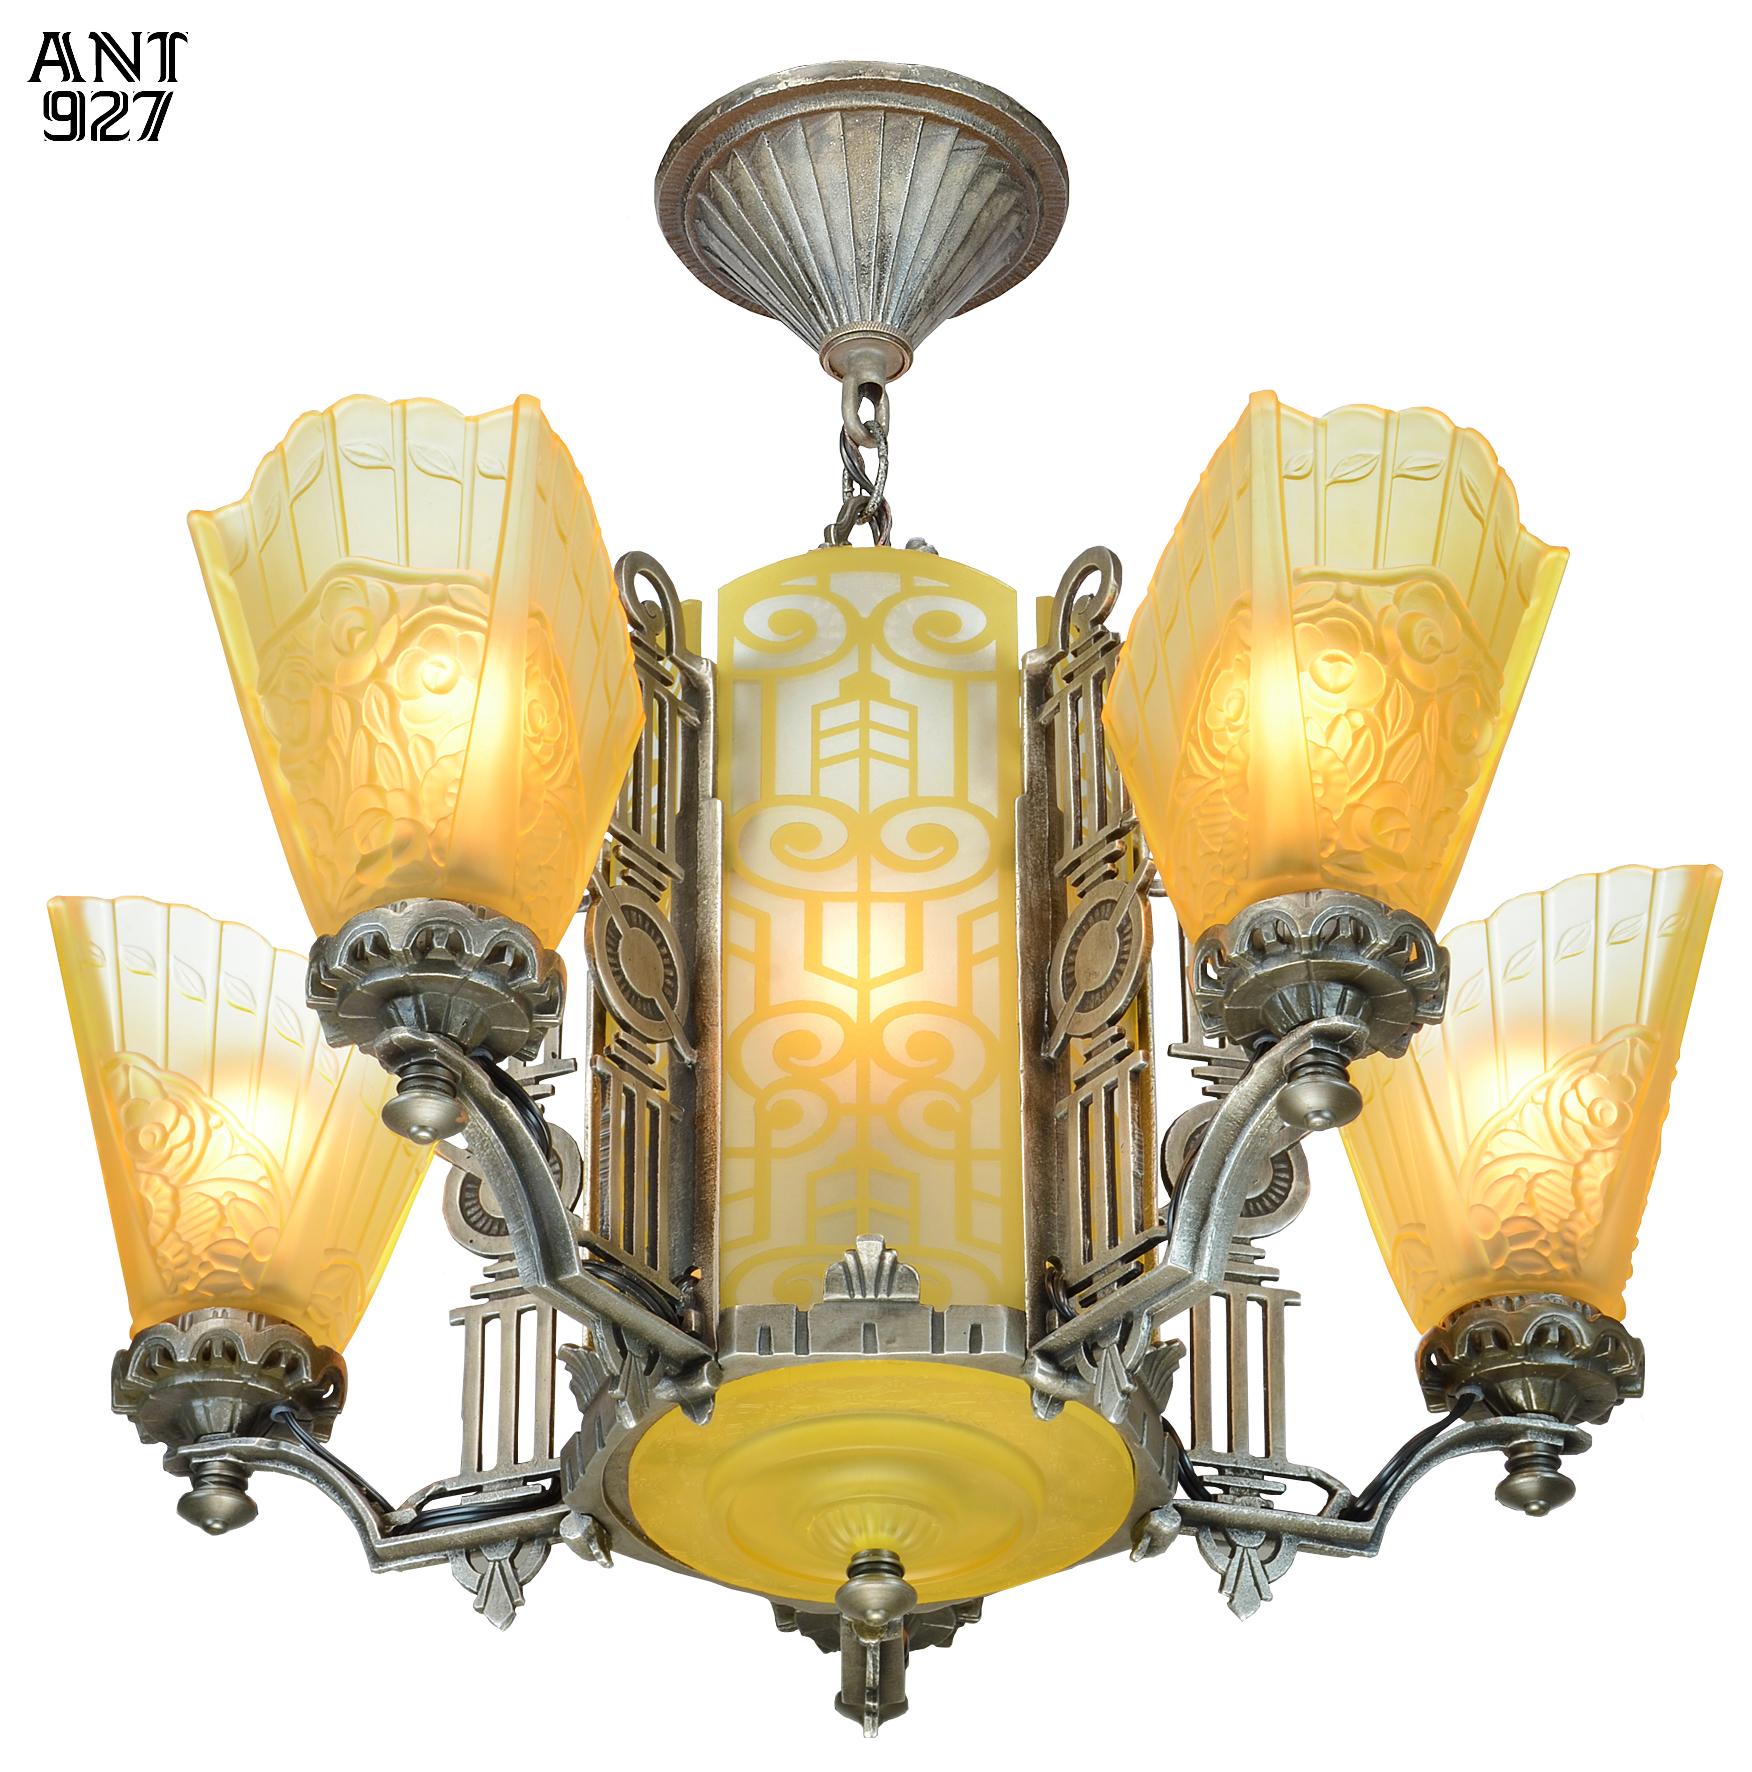 Vintage hardware lighting art deco slip shade chandelier with mgctlbxnmzp mgctlbxv5111 mgctlbxlc aloadofball Gallery